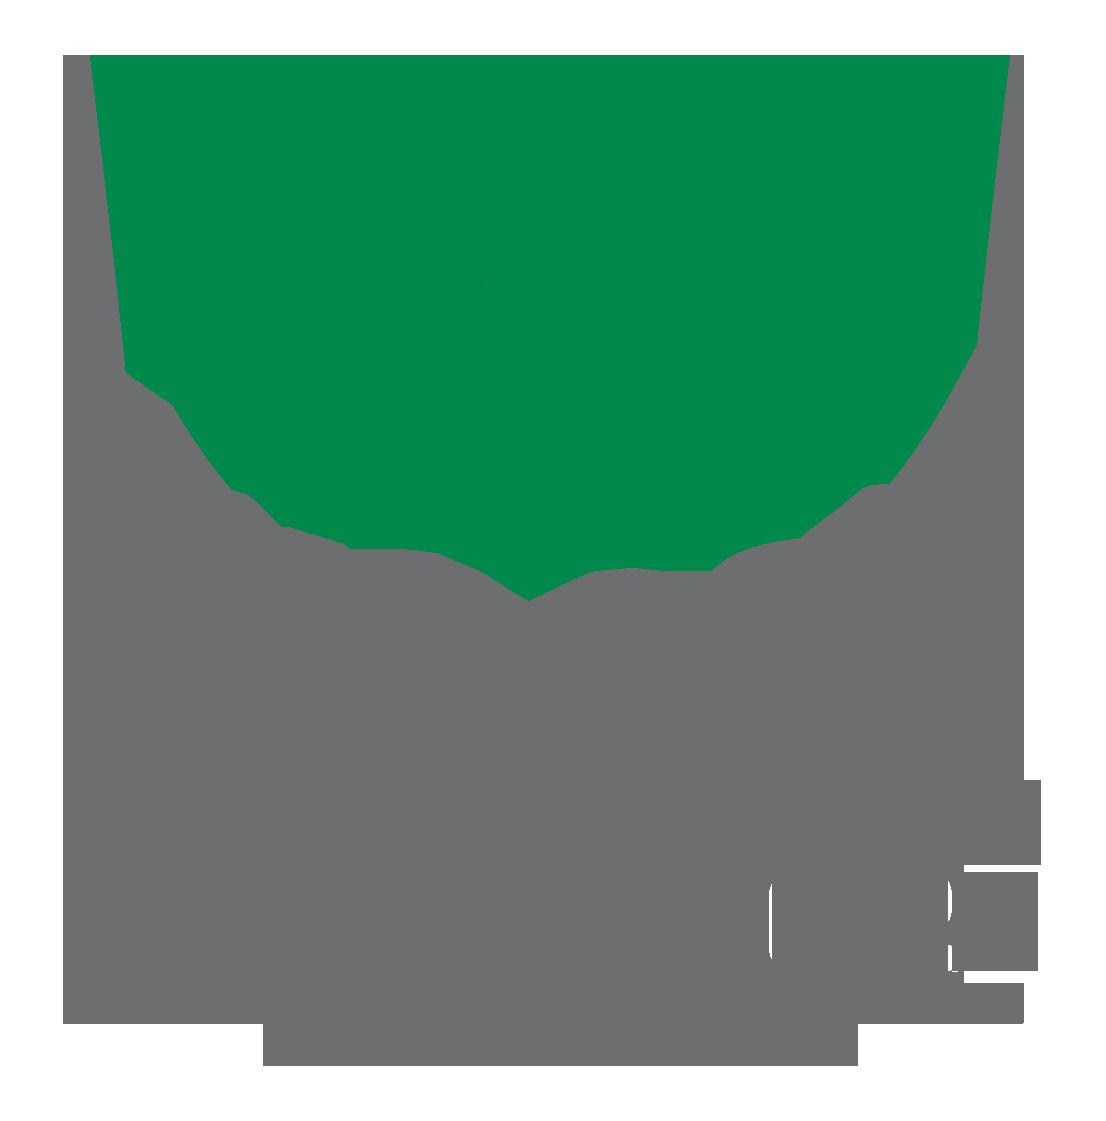 Lukkari-Jukola 2022